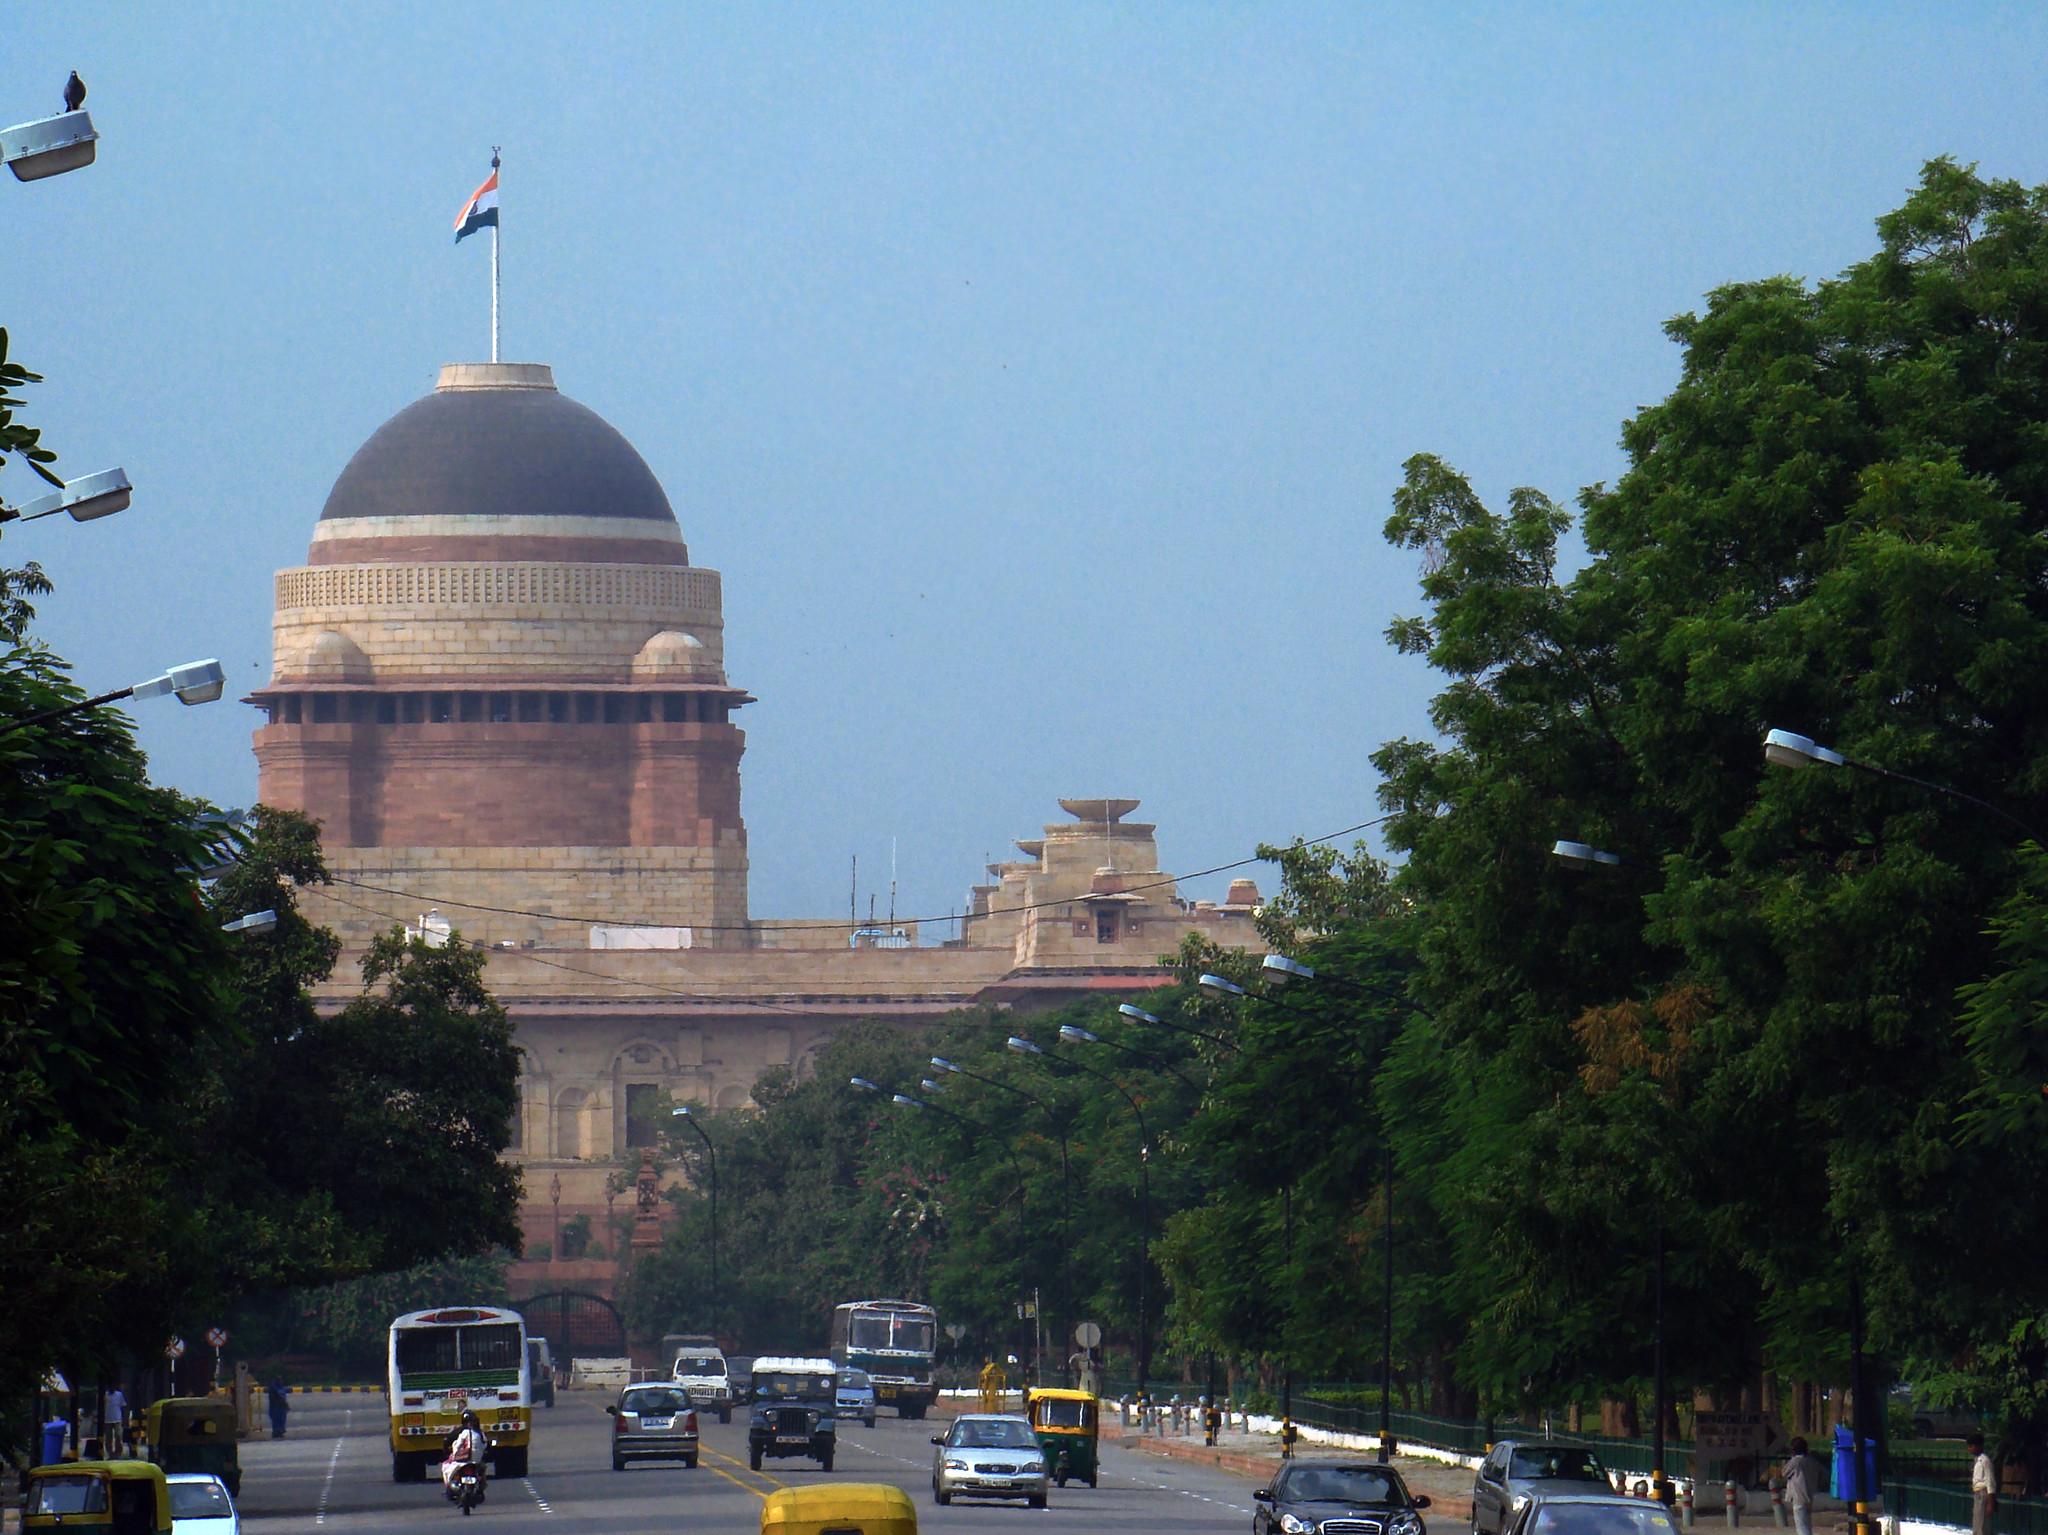 cupula edificio exterior Casa presidencial o Rashtrapati Bhavan Delhi India